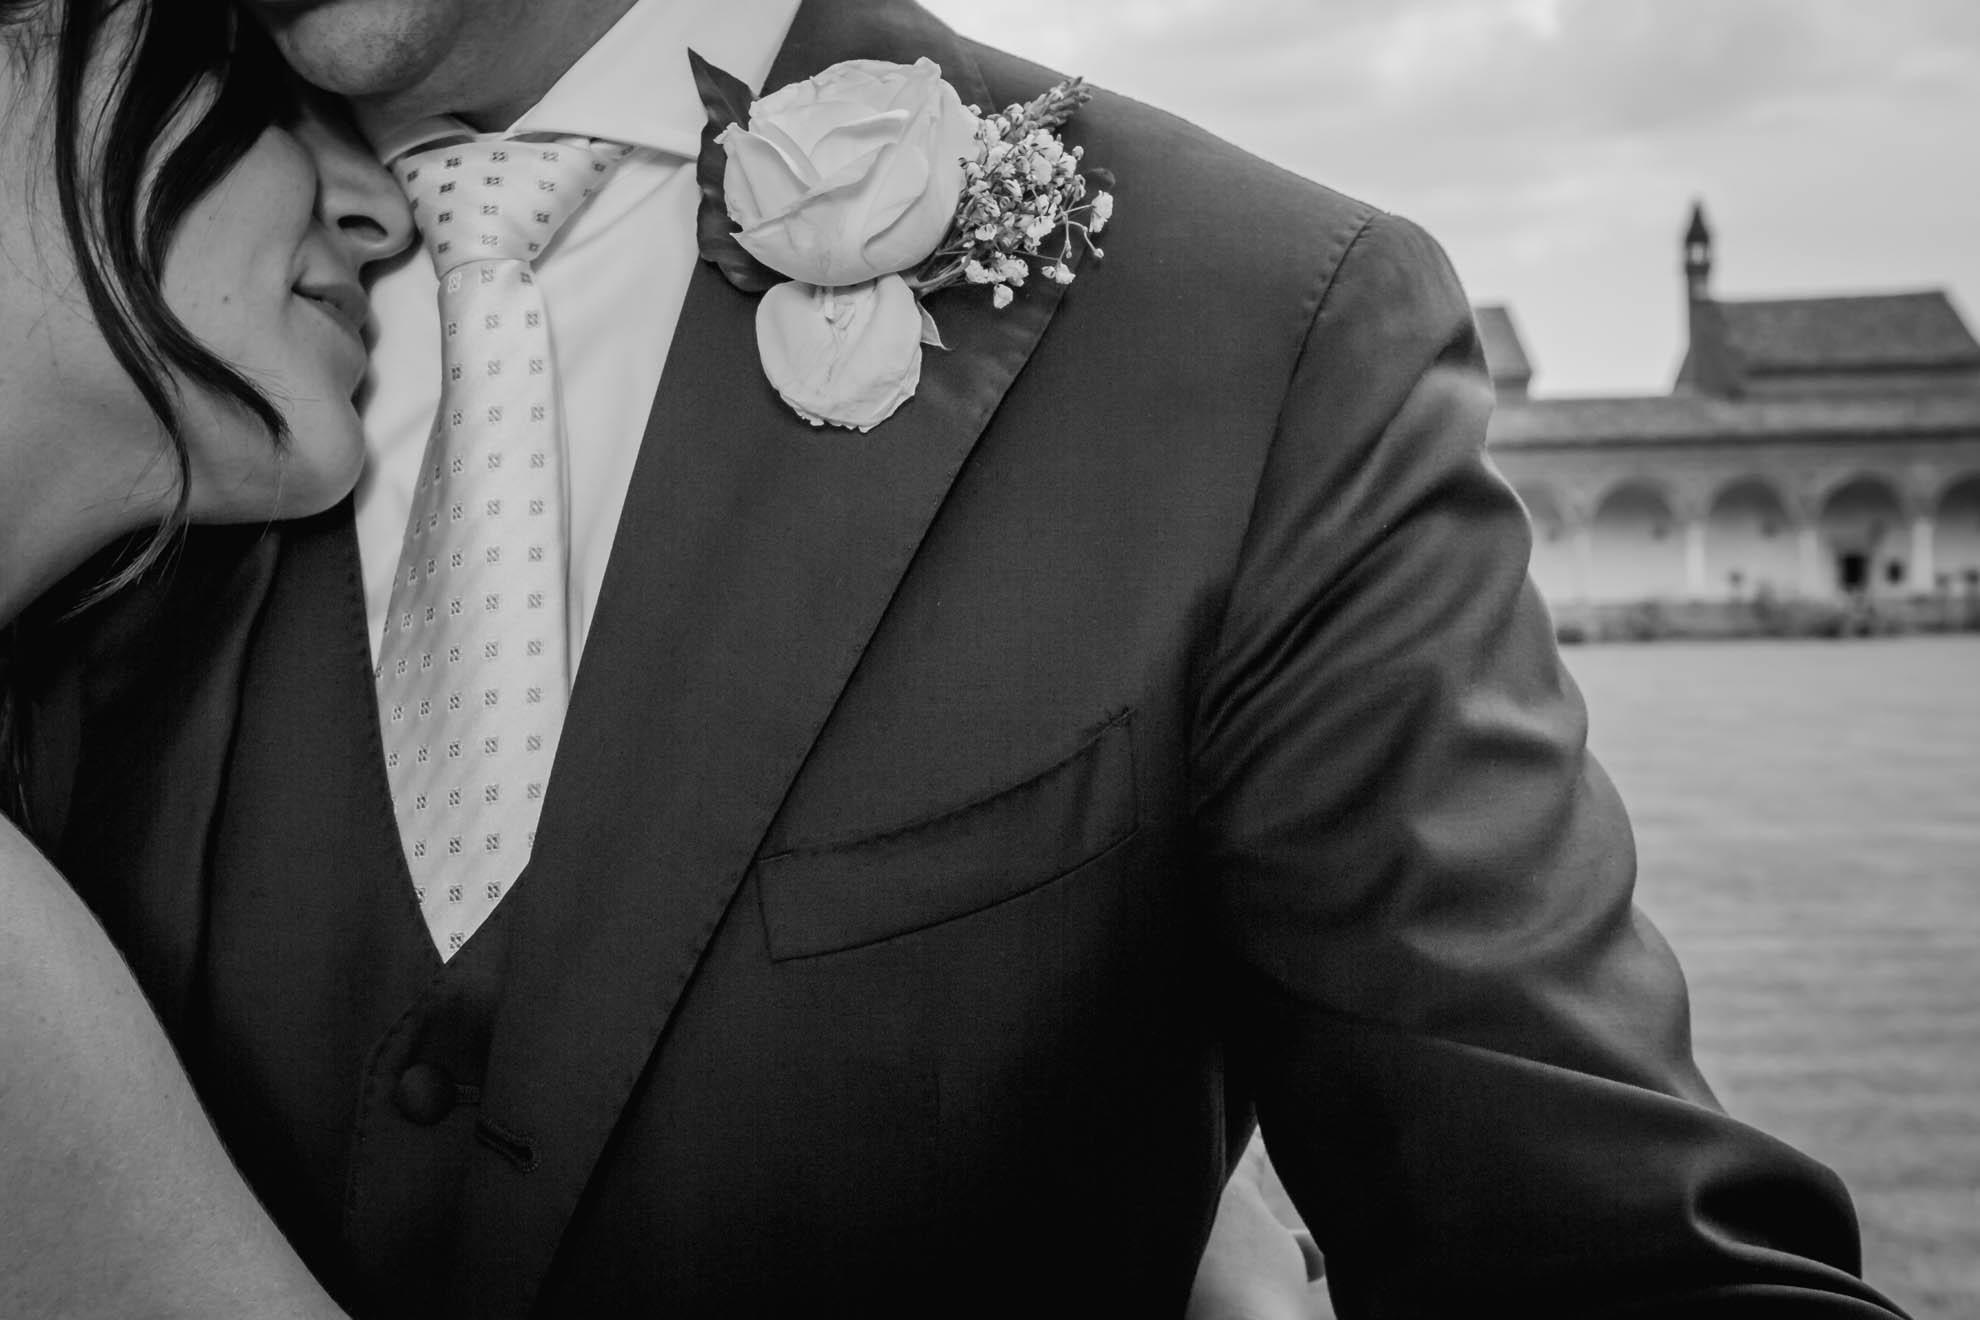 007 Fotografo per Matrimonio Diego Ravenna PaviaIMG_0789